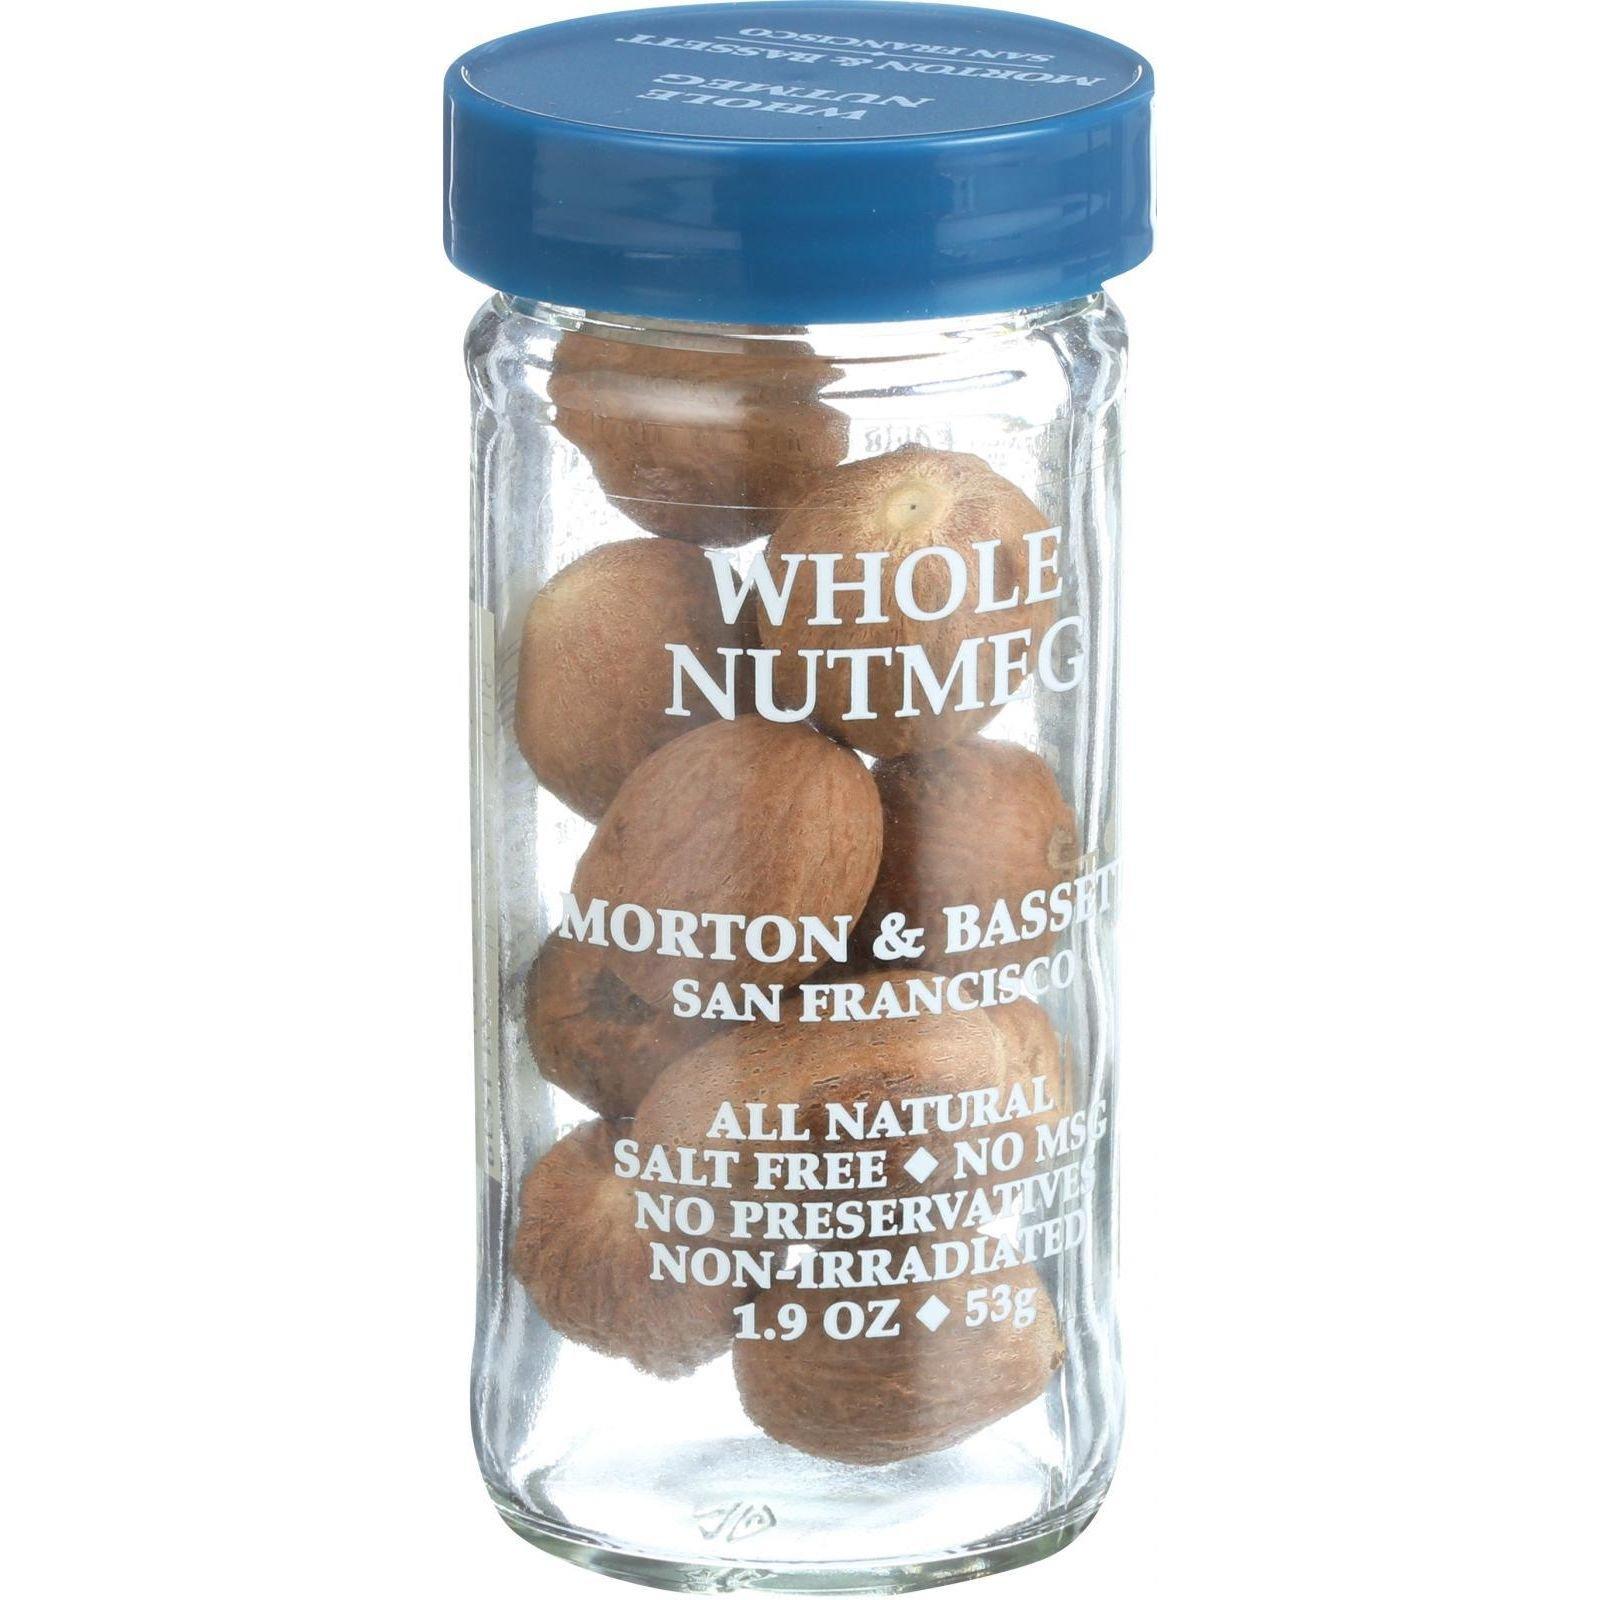 Morton and Bassett Seasoning - Nutmeg - Whole - 2.2 oz - Case of 3 by Morton & Bassett (Image #1)